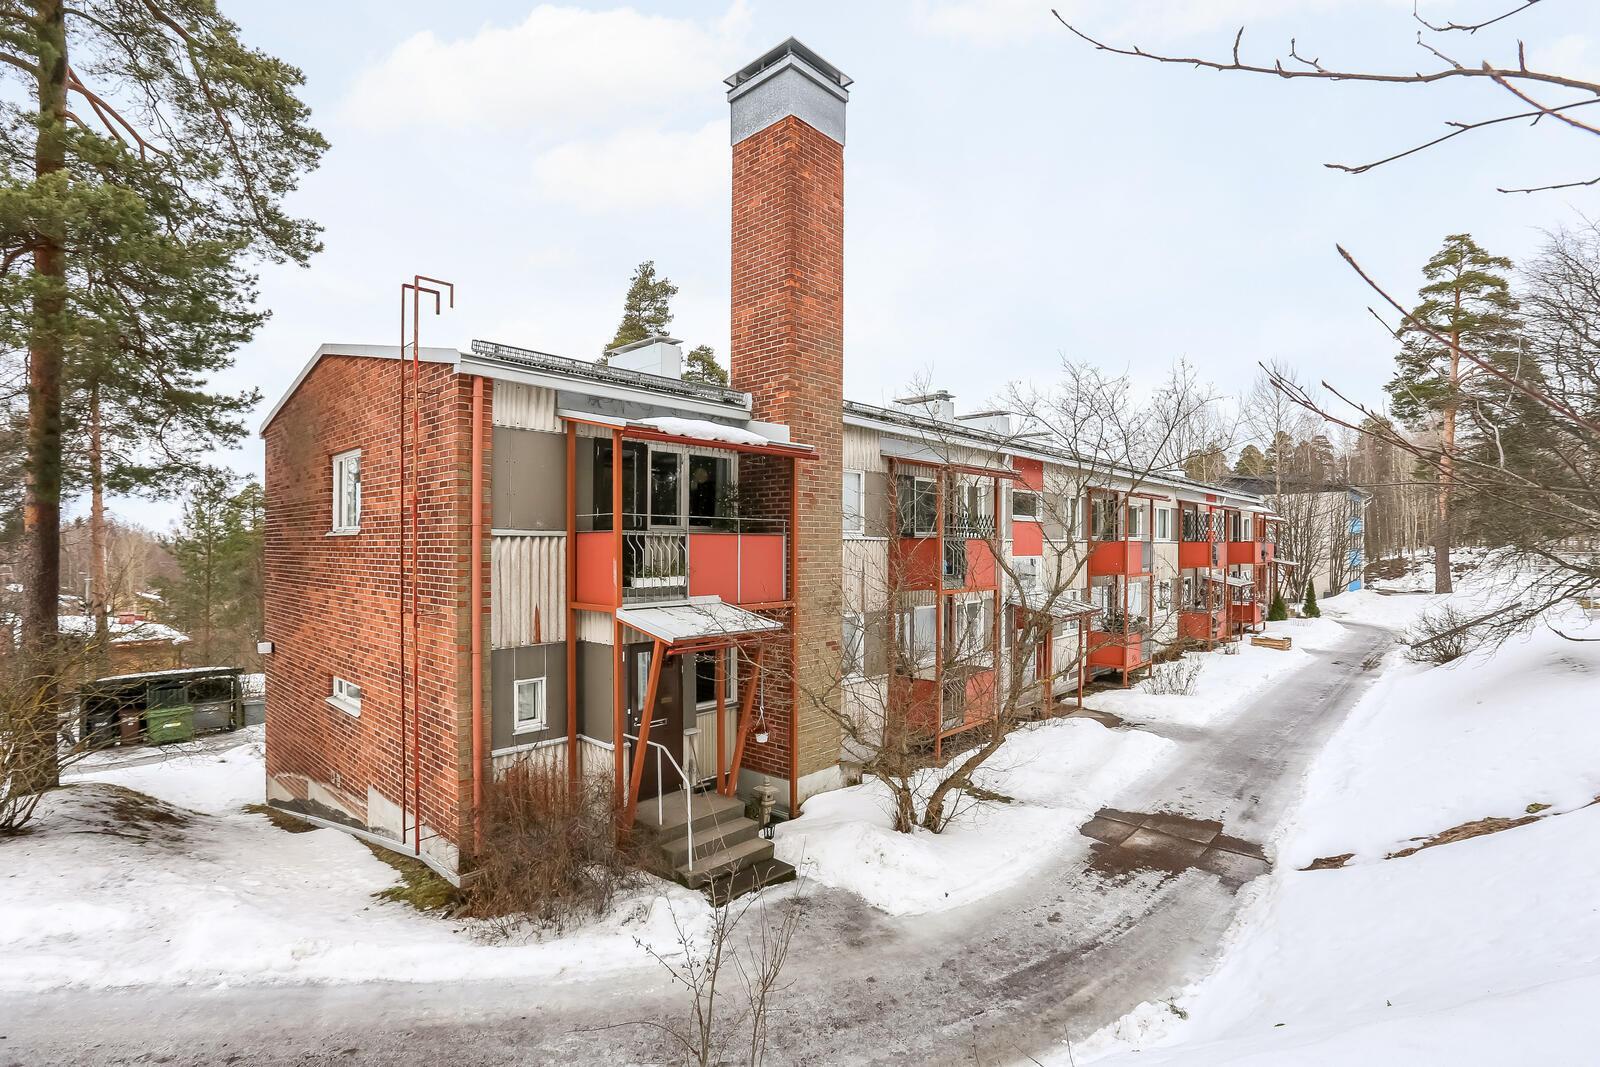 Kimpinen, Lappeenranta